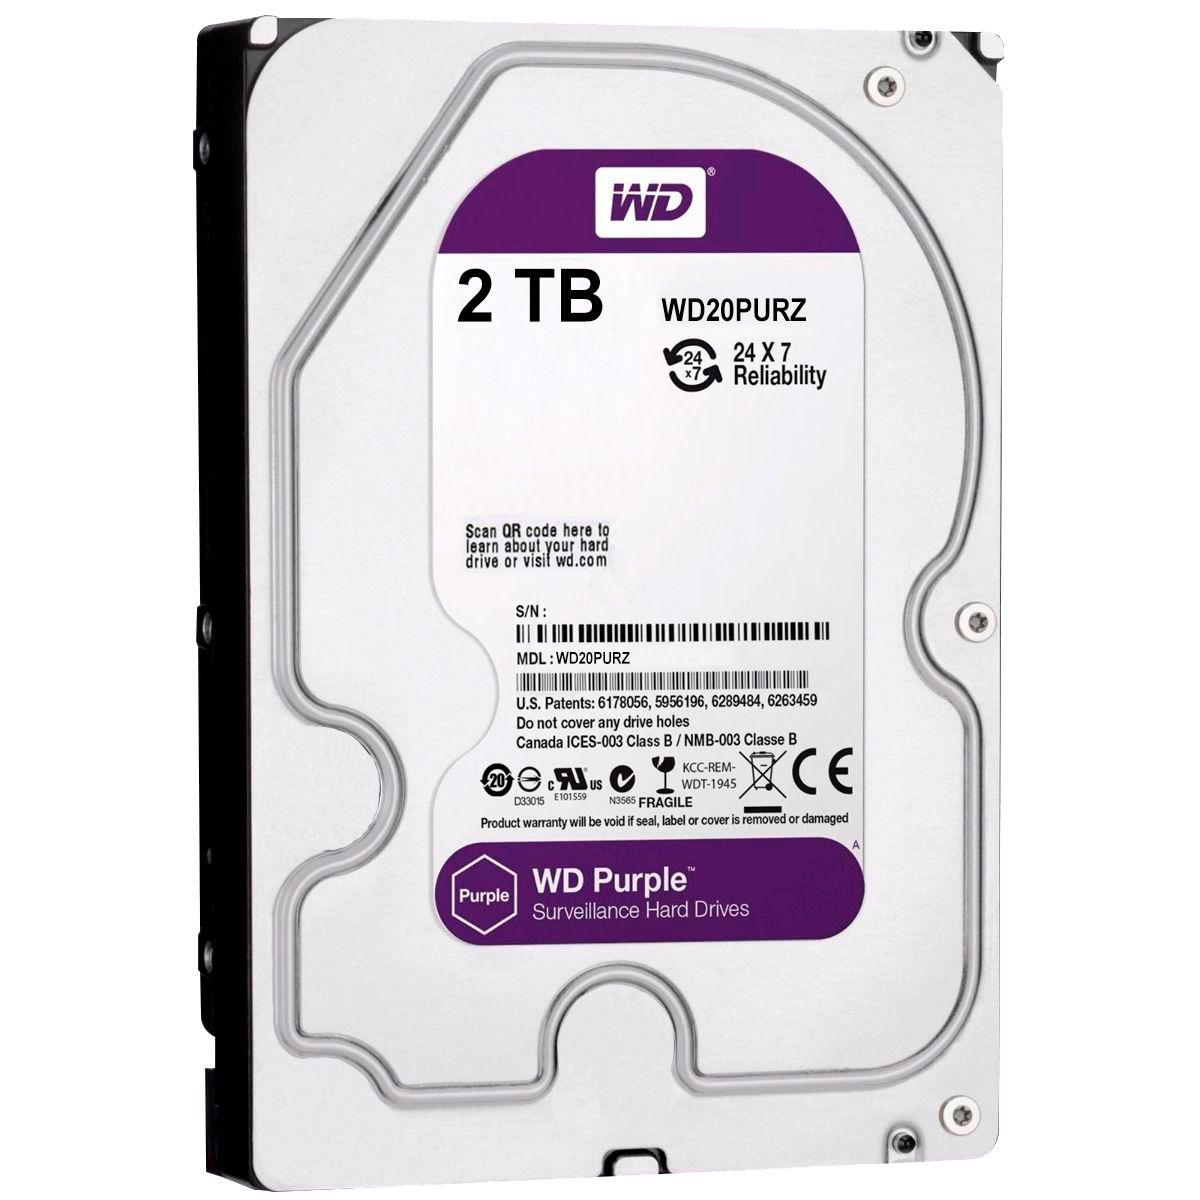 Kit 8 Câmeras de Segurança Full HD 1080p VHD 1220B IR + DVR Intelbras Full HD + HD WD Purple 2TB + Acessórios  - Tudo Forte